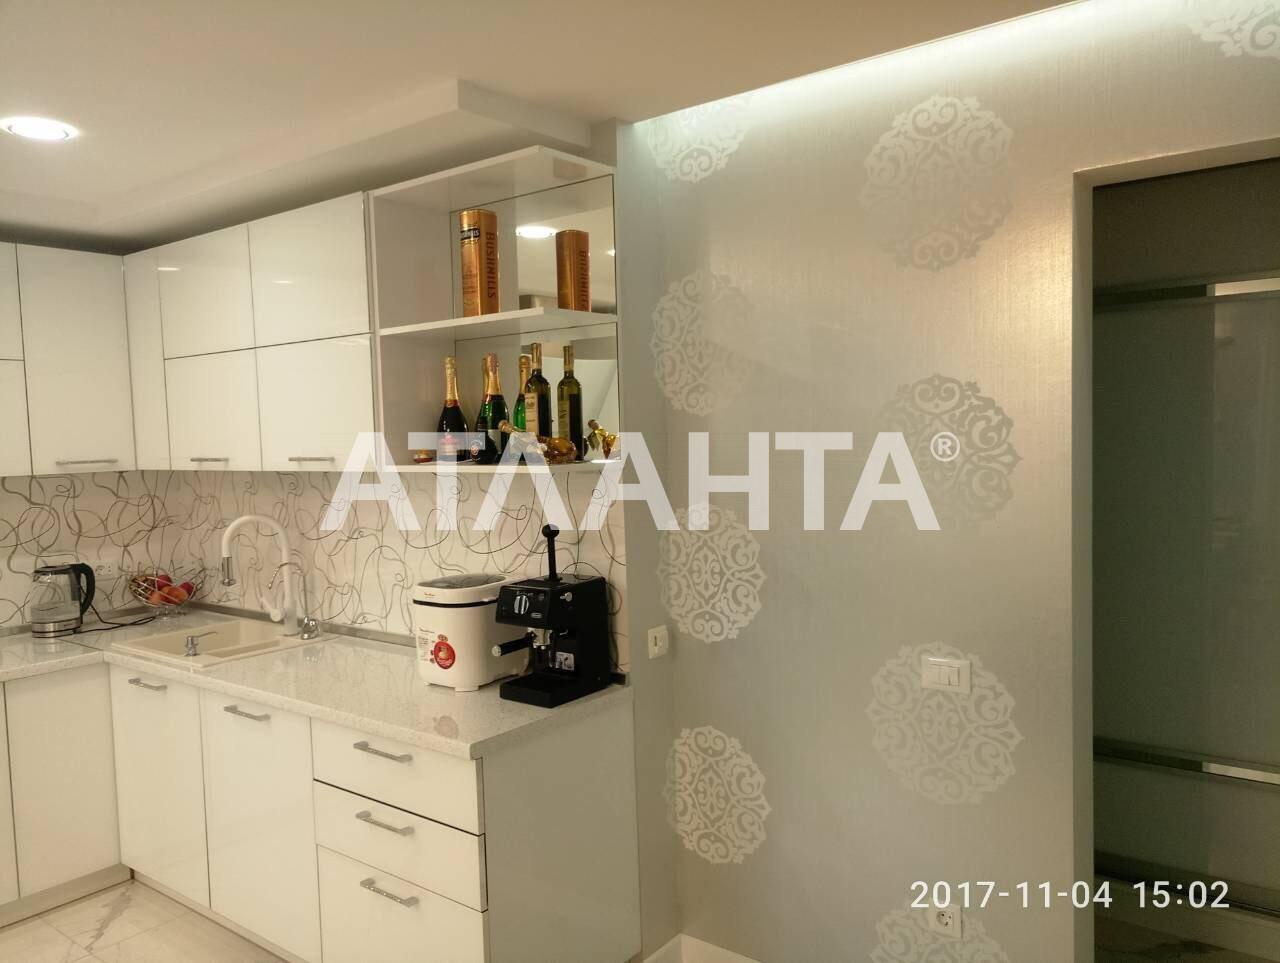 Продается 2-комнатная Квартира на ул. Леваневского Пер. — 95 000 у.е. (фото №8)